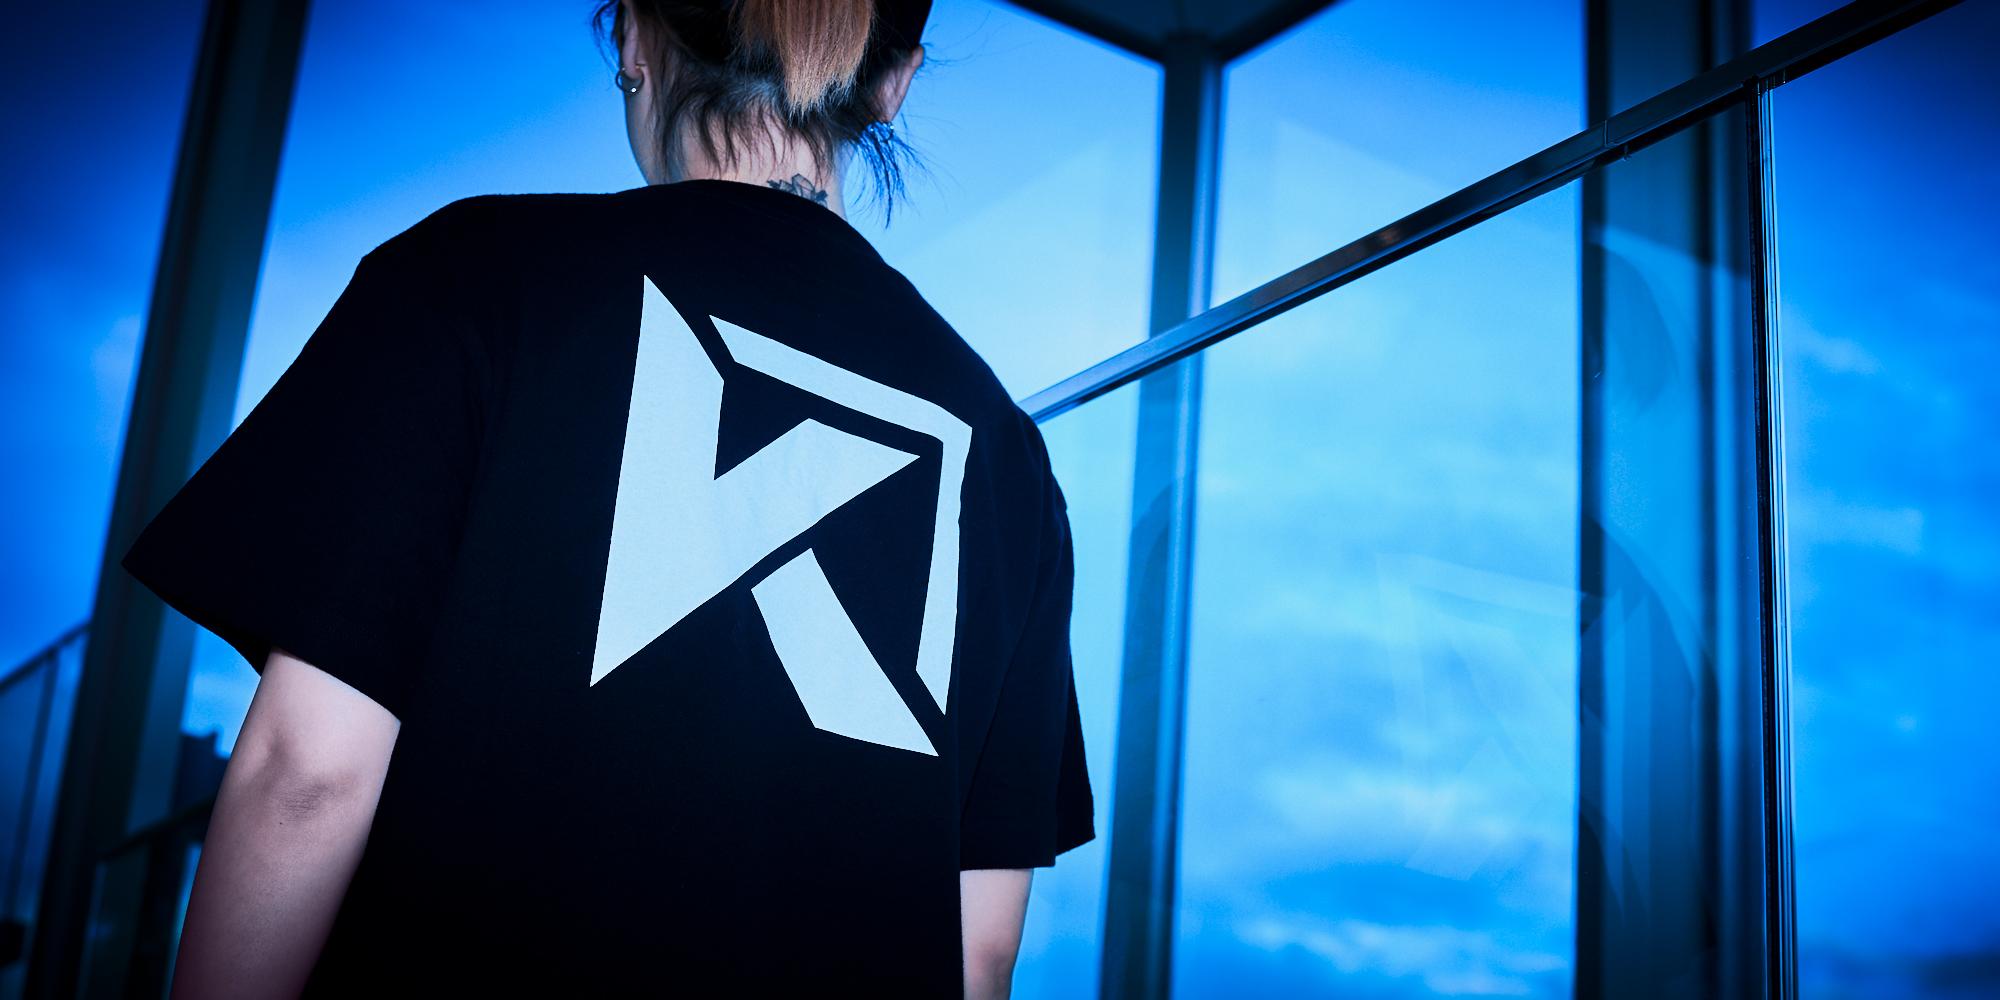 kurat-shirt_2